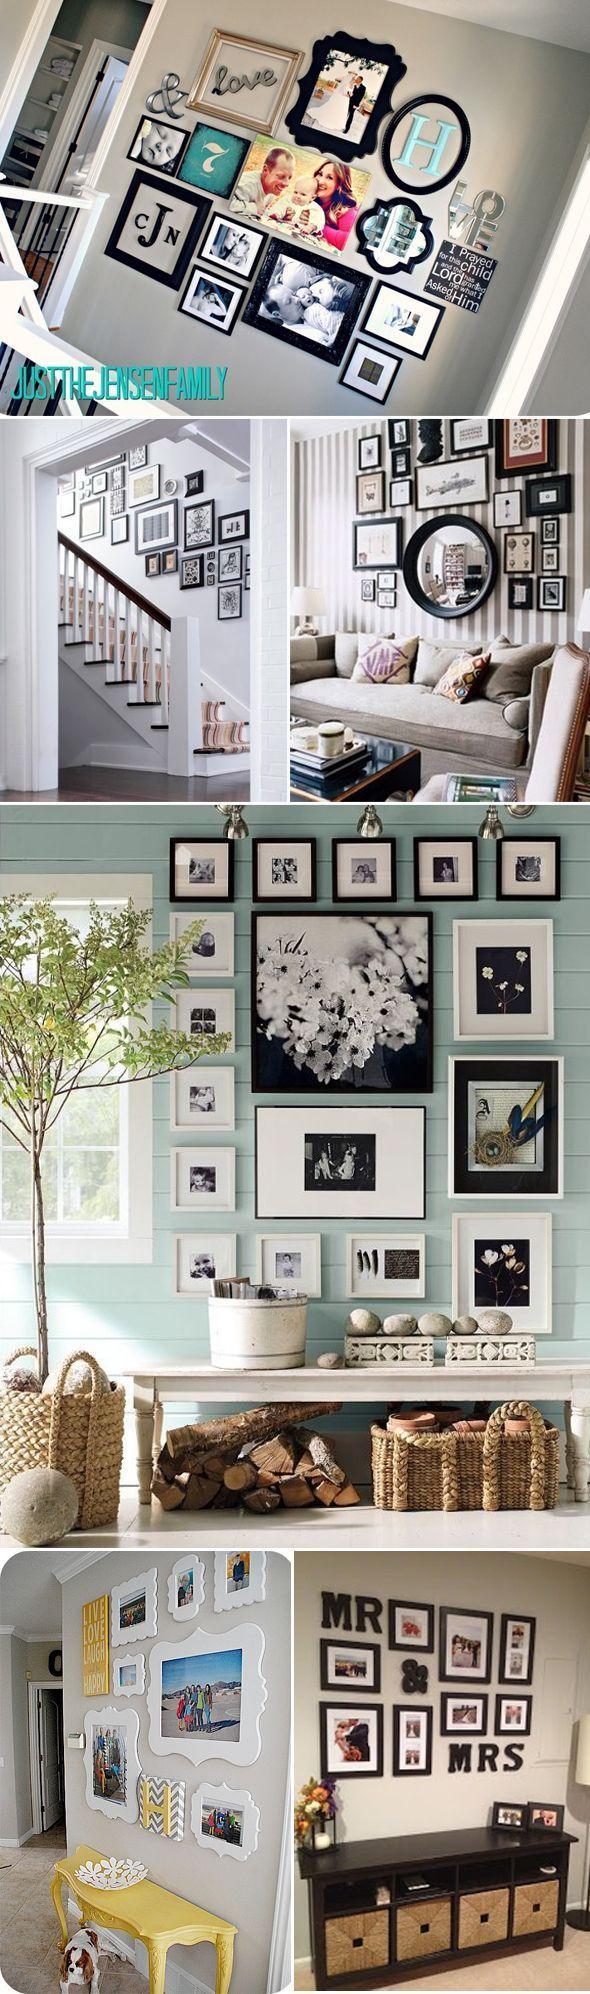 Best 25 photo wall decor ideas on pinterest living room decor 15 easy and wonderful diy bookshelves ideas 14 wall decor amipublicfo Gallery